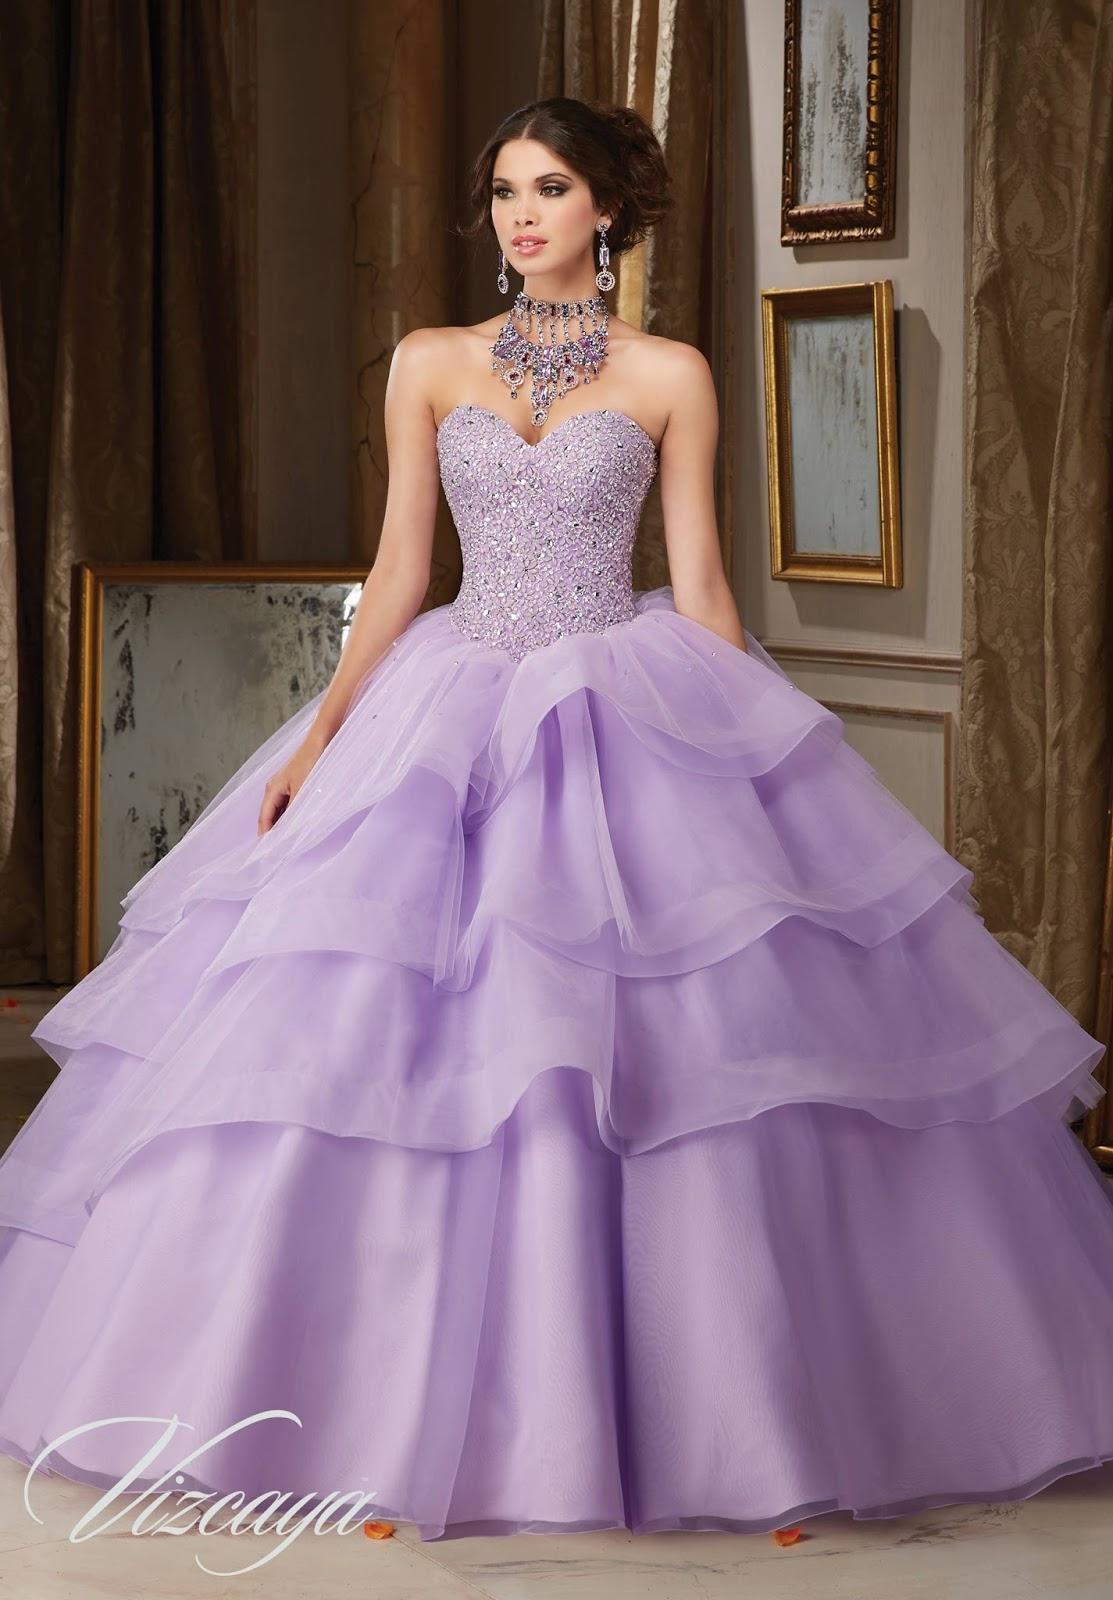 388d20fa8e Vestidos de XV Años Modernos ¡10 Lindos Modelos!